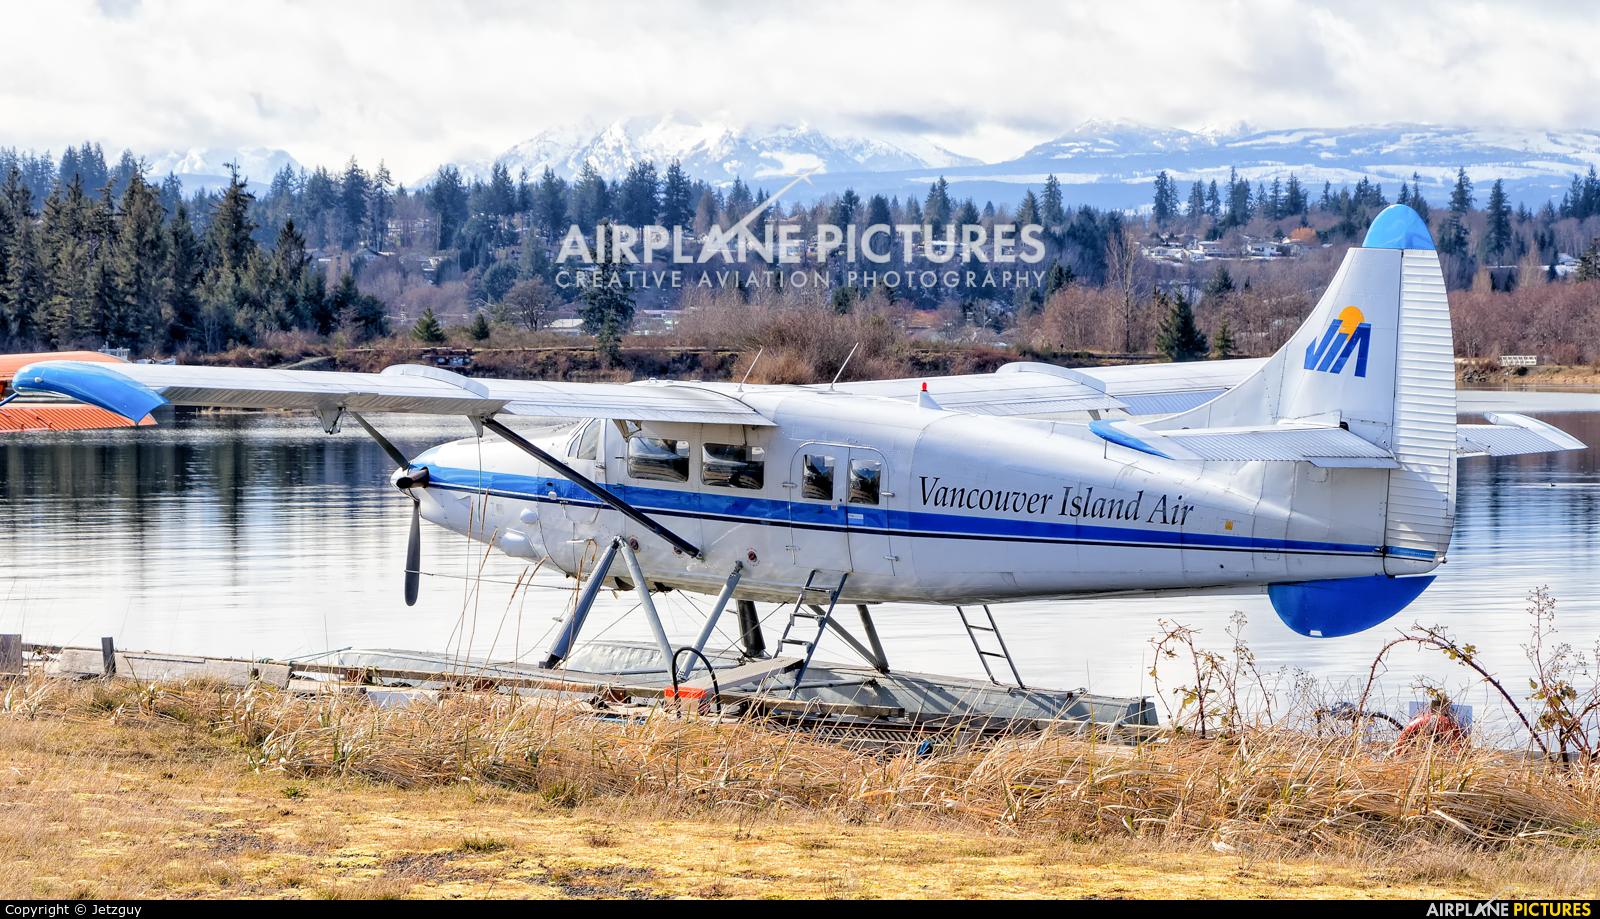 Vancouver Island Air C-GVIX aircraft at Campbell River Seaplane Base